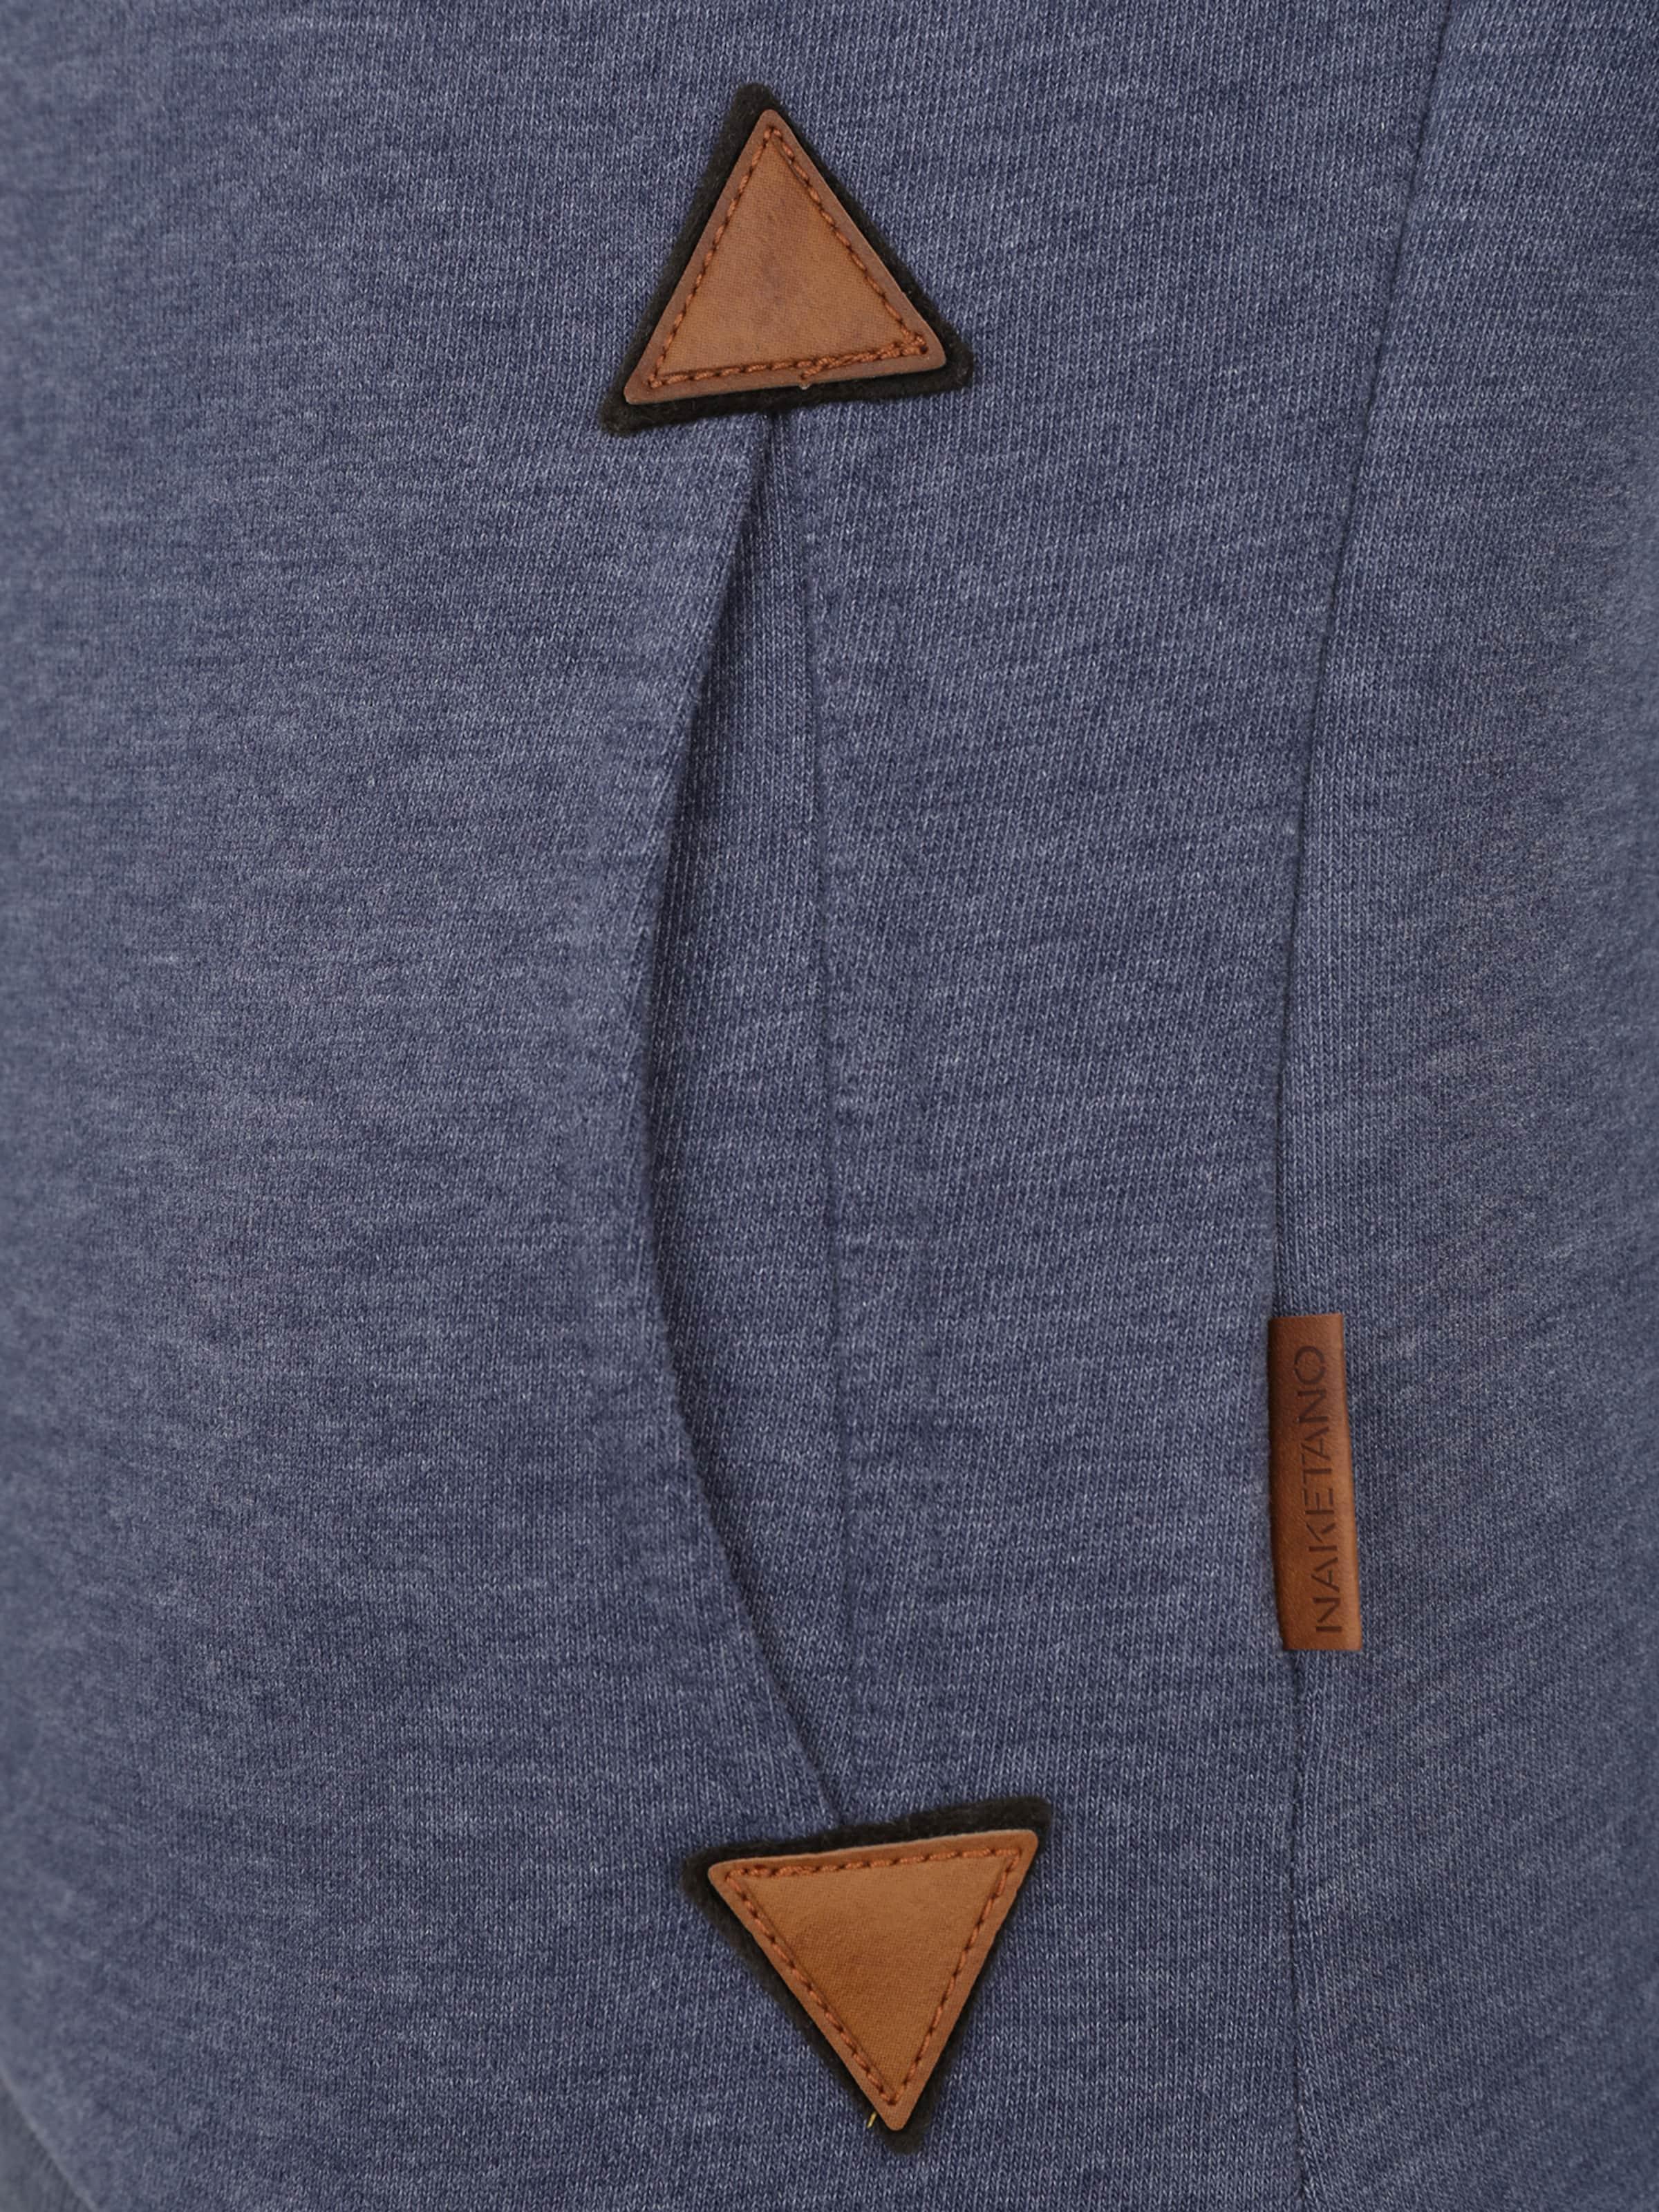 Bleu 'patty Framboise Hoch' En Hände NuitRose Naketano Sweat Immer shirt Y6gbf7vy